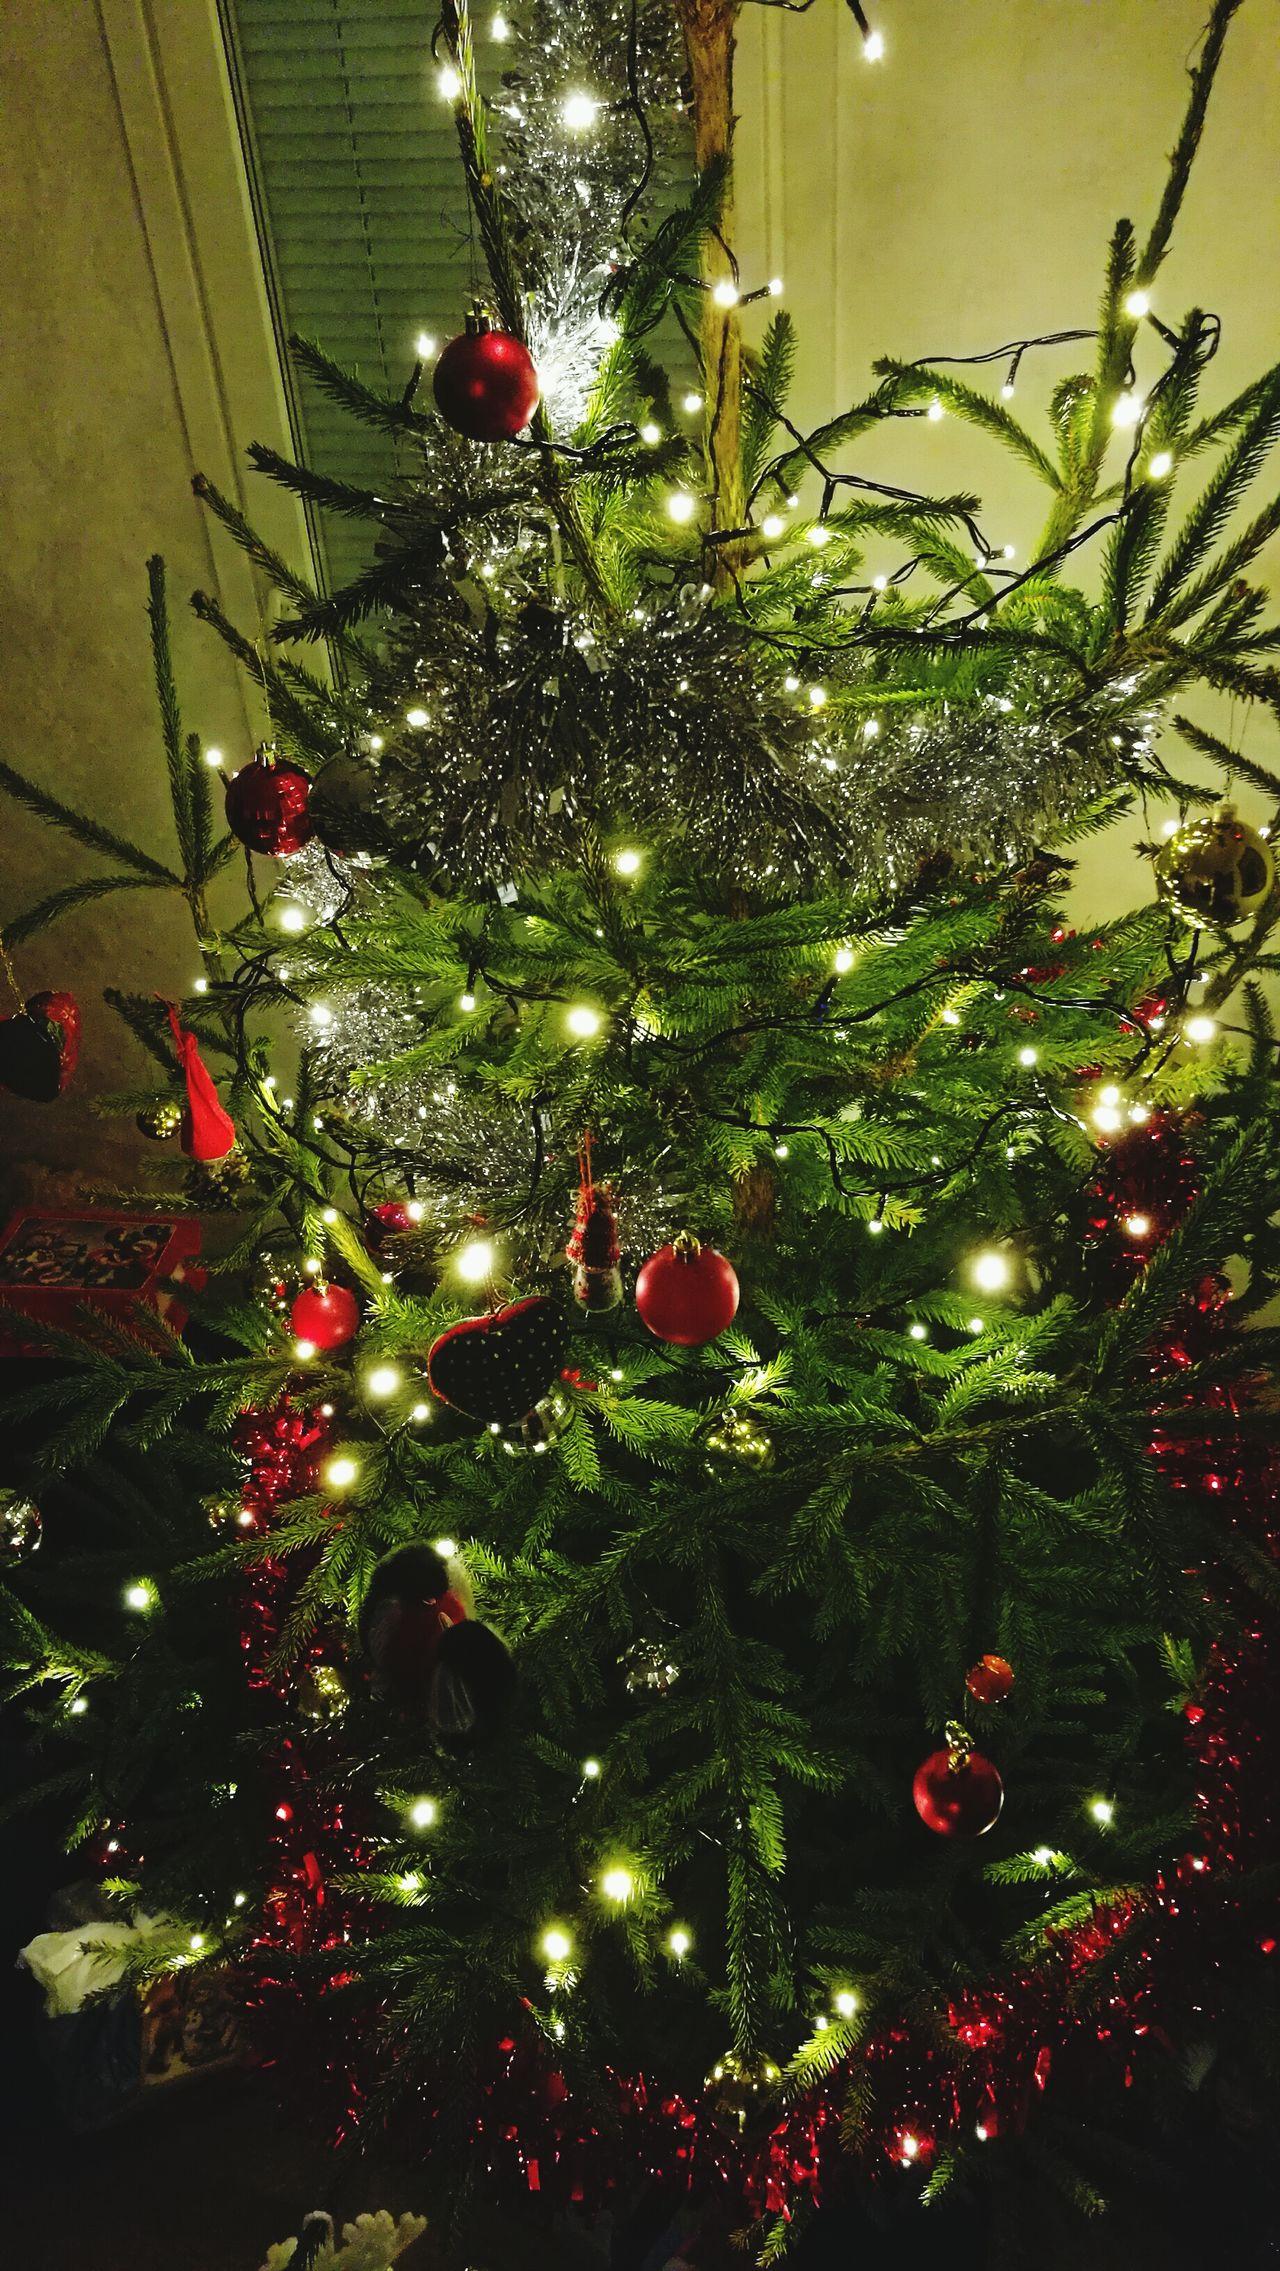 MerryChristmas Happy Holidays! Christmas Tree Christmastime Hyvää Joulua Joululahjat Family Family Time Love Love Is In The Air Feliznavidad